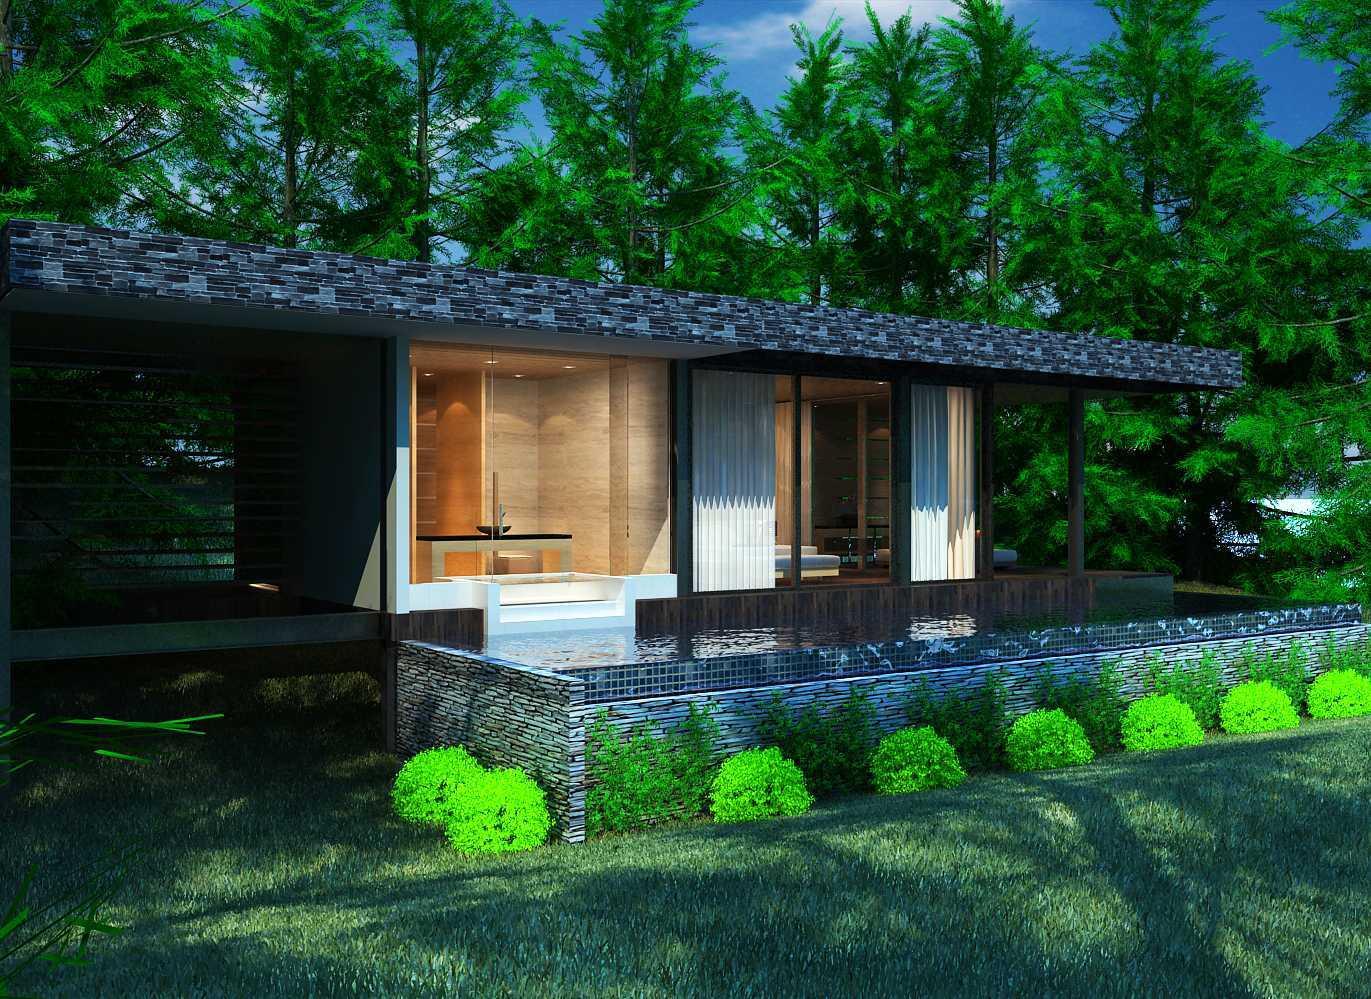 Donny Steven Massie The Vila Pecat Bali Bali Perspektif Tropis  23501